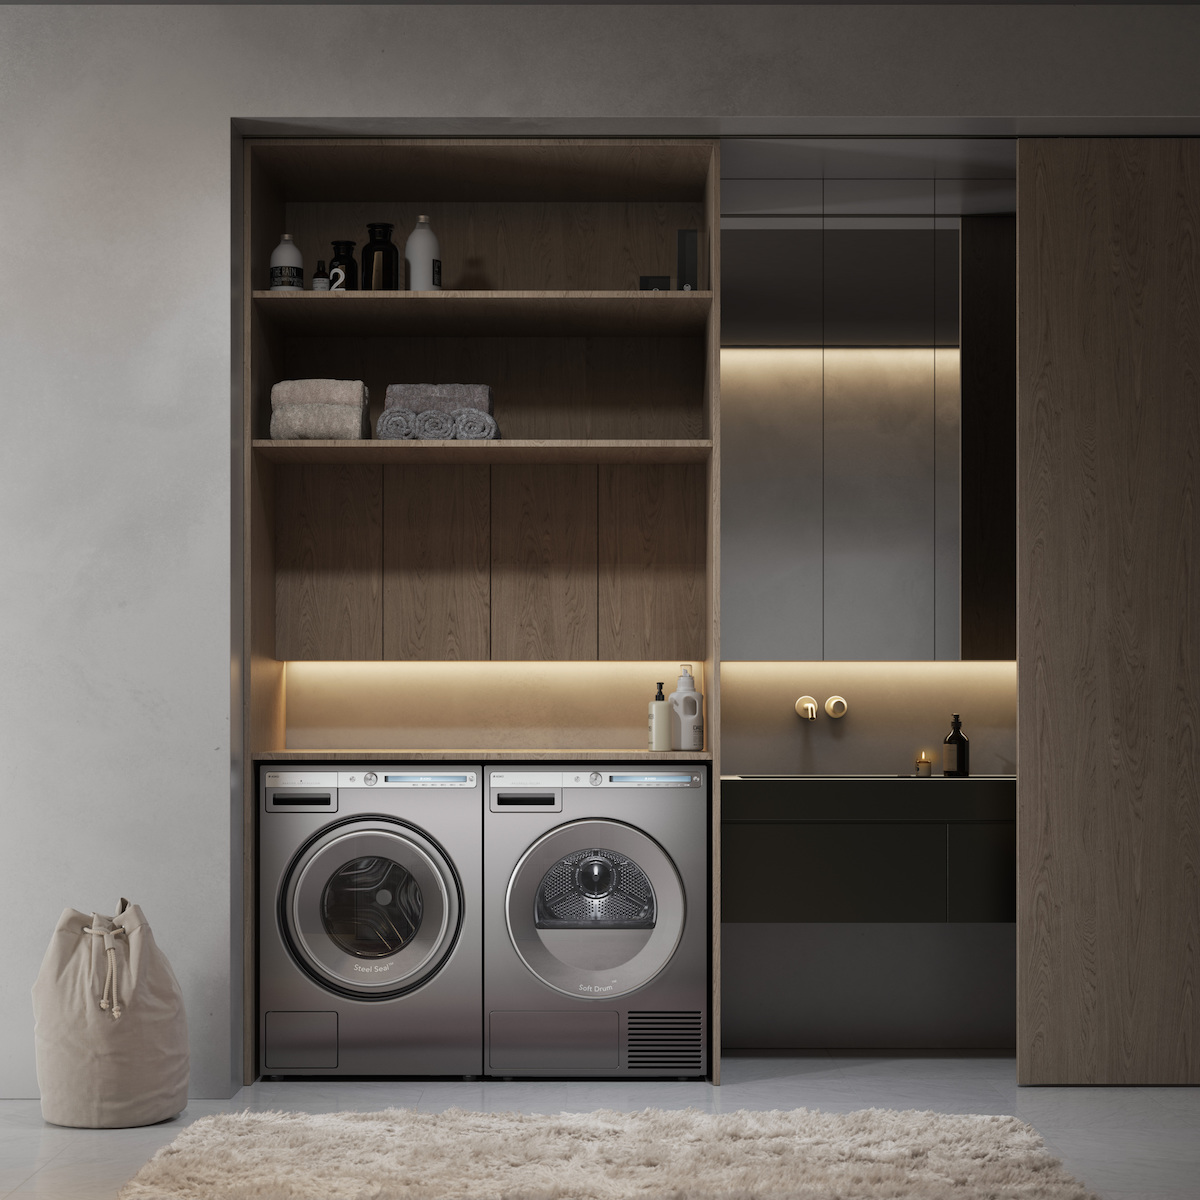 171946_file_print_asko-amb-laundry-Bathroom_sbs_logic_t_display